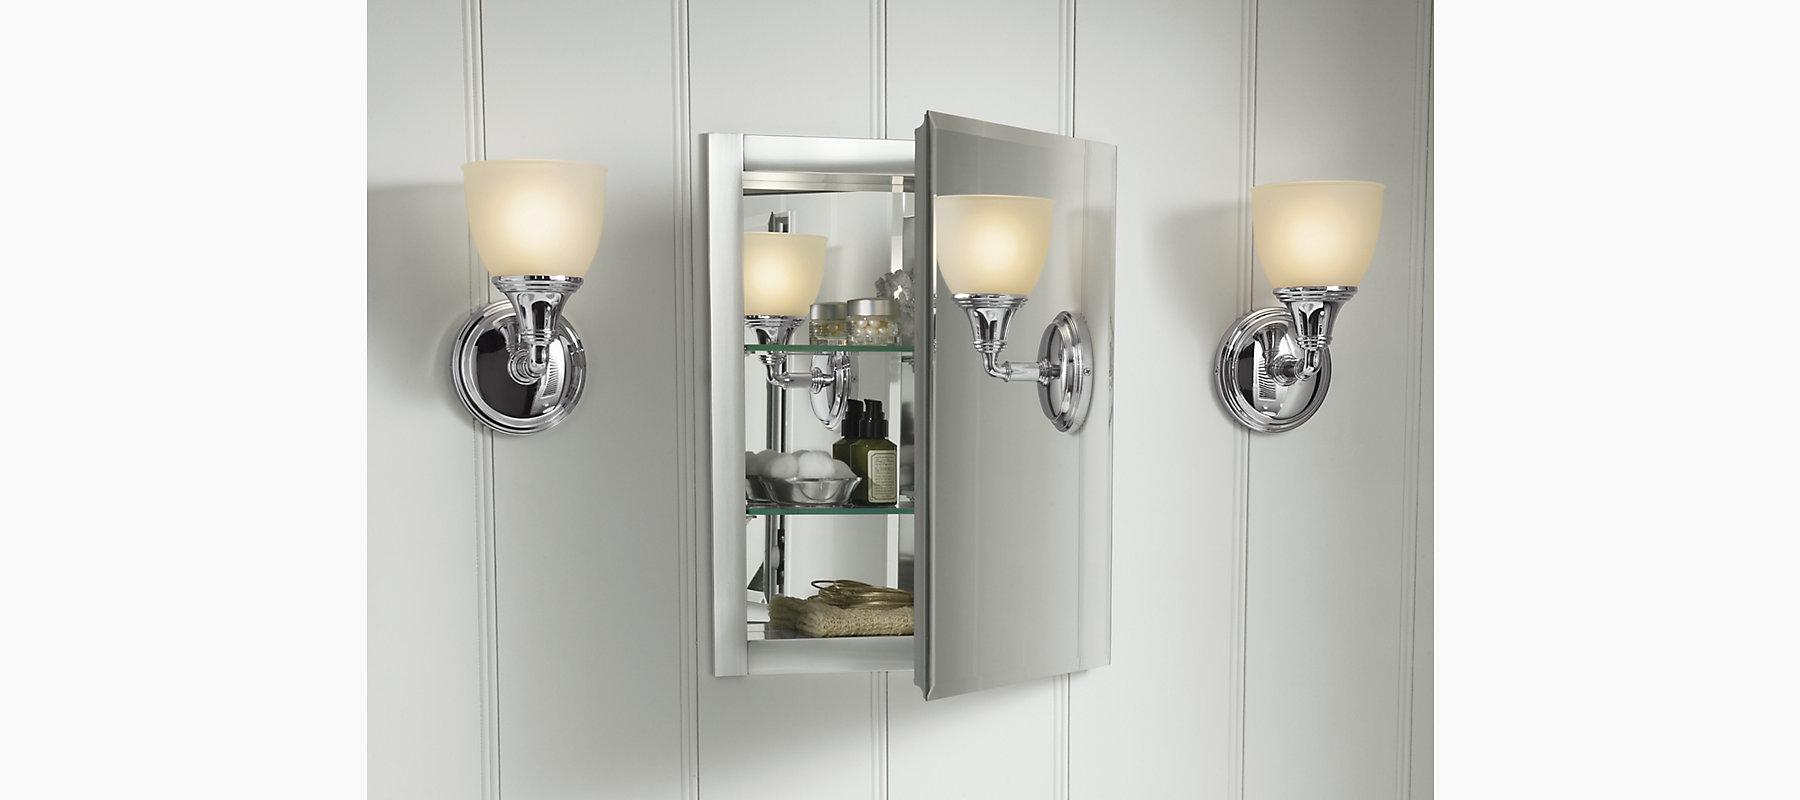 Kohler Bathroom Medicine Cabinets Specials For Baltimore